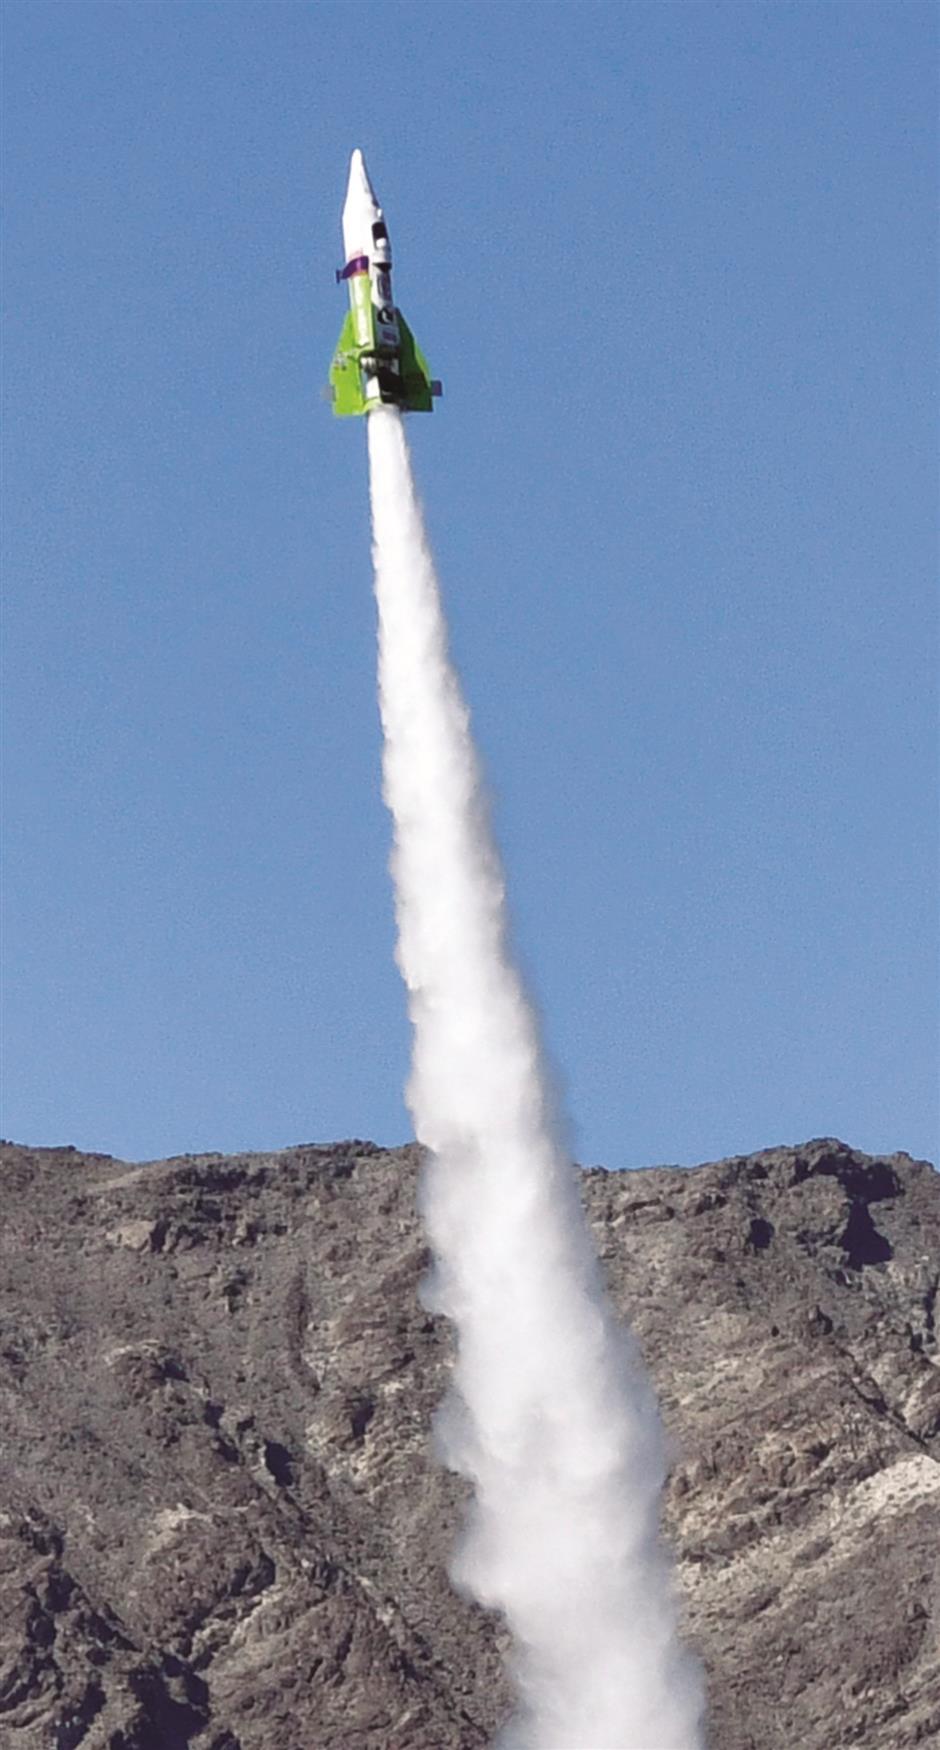 Self-taught rocket scientist finally blasts off